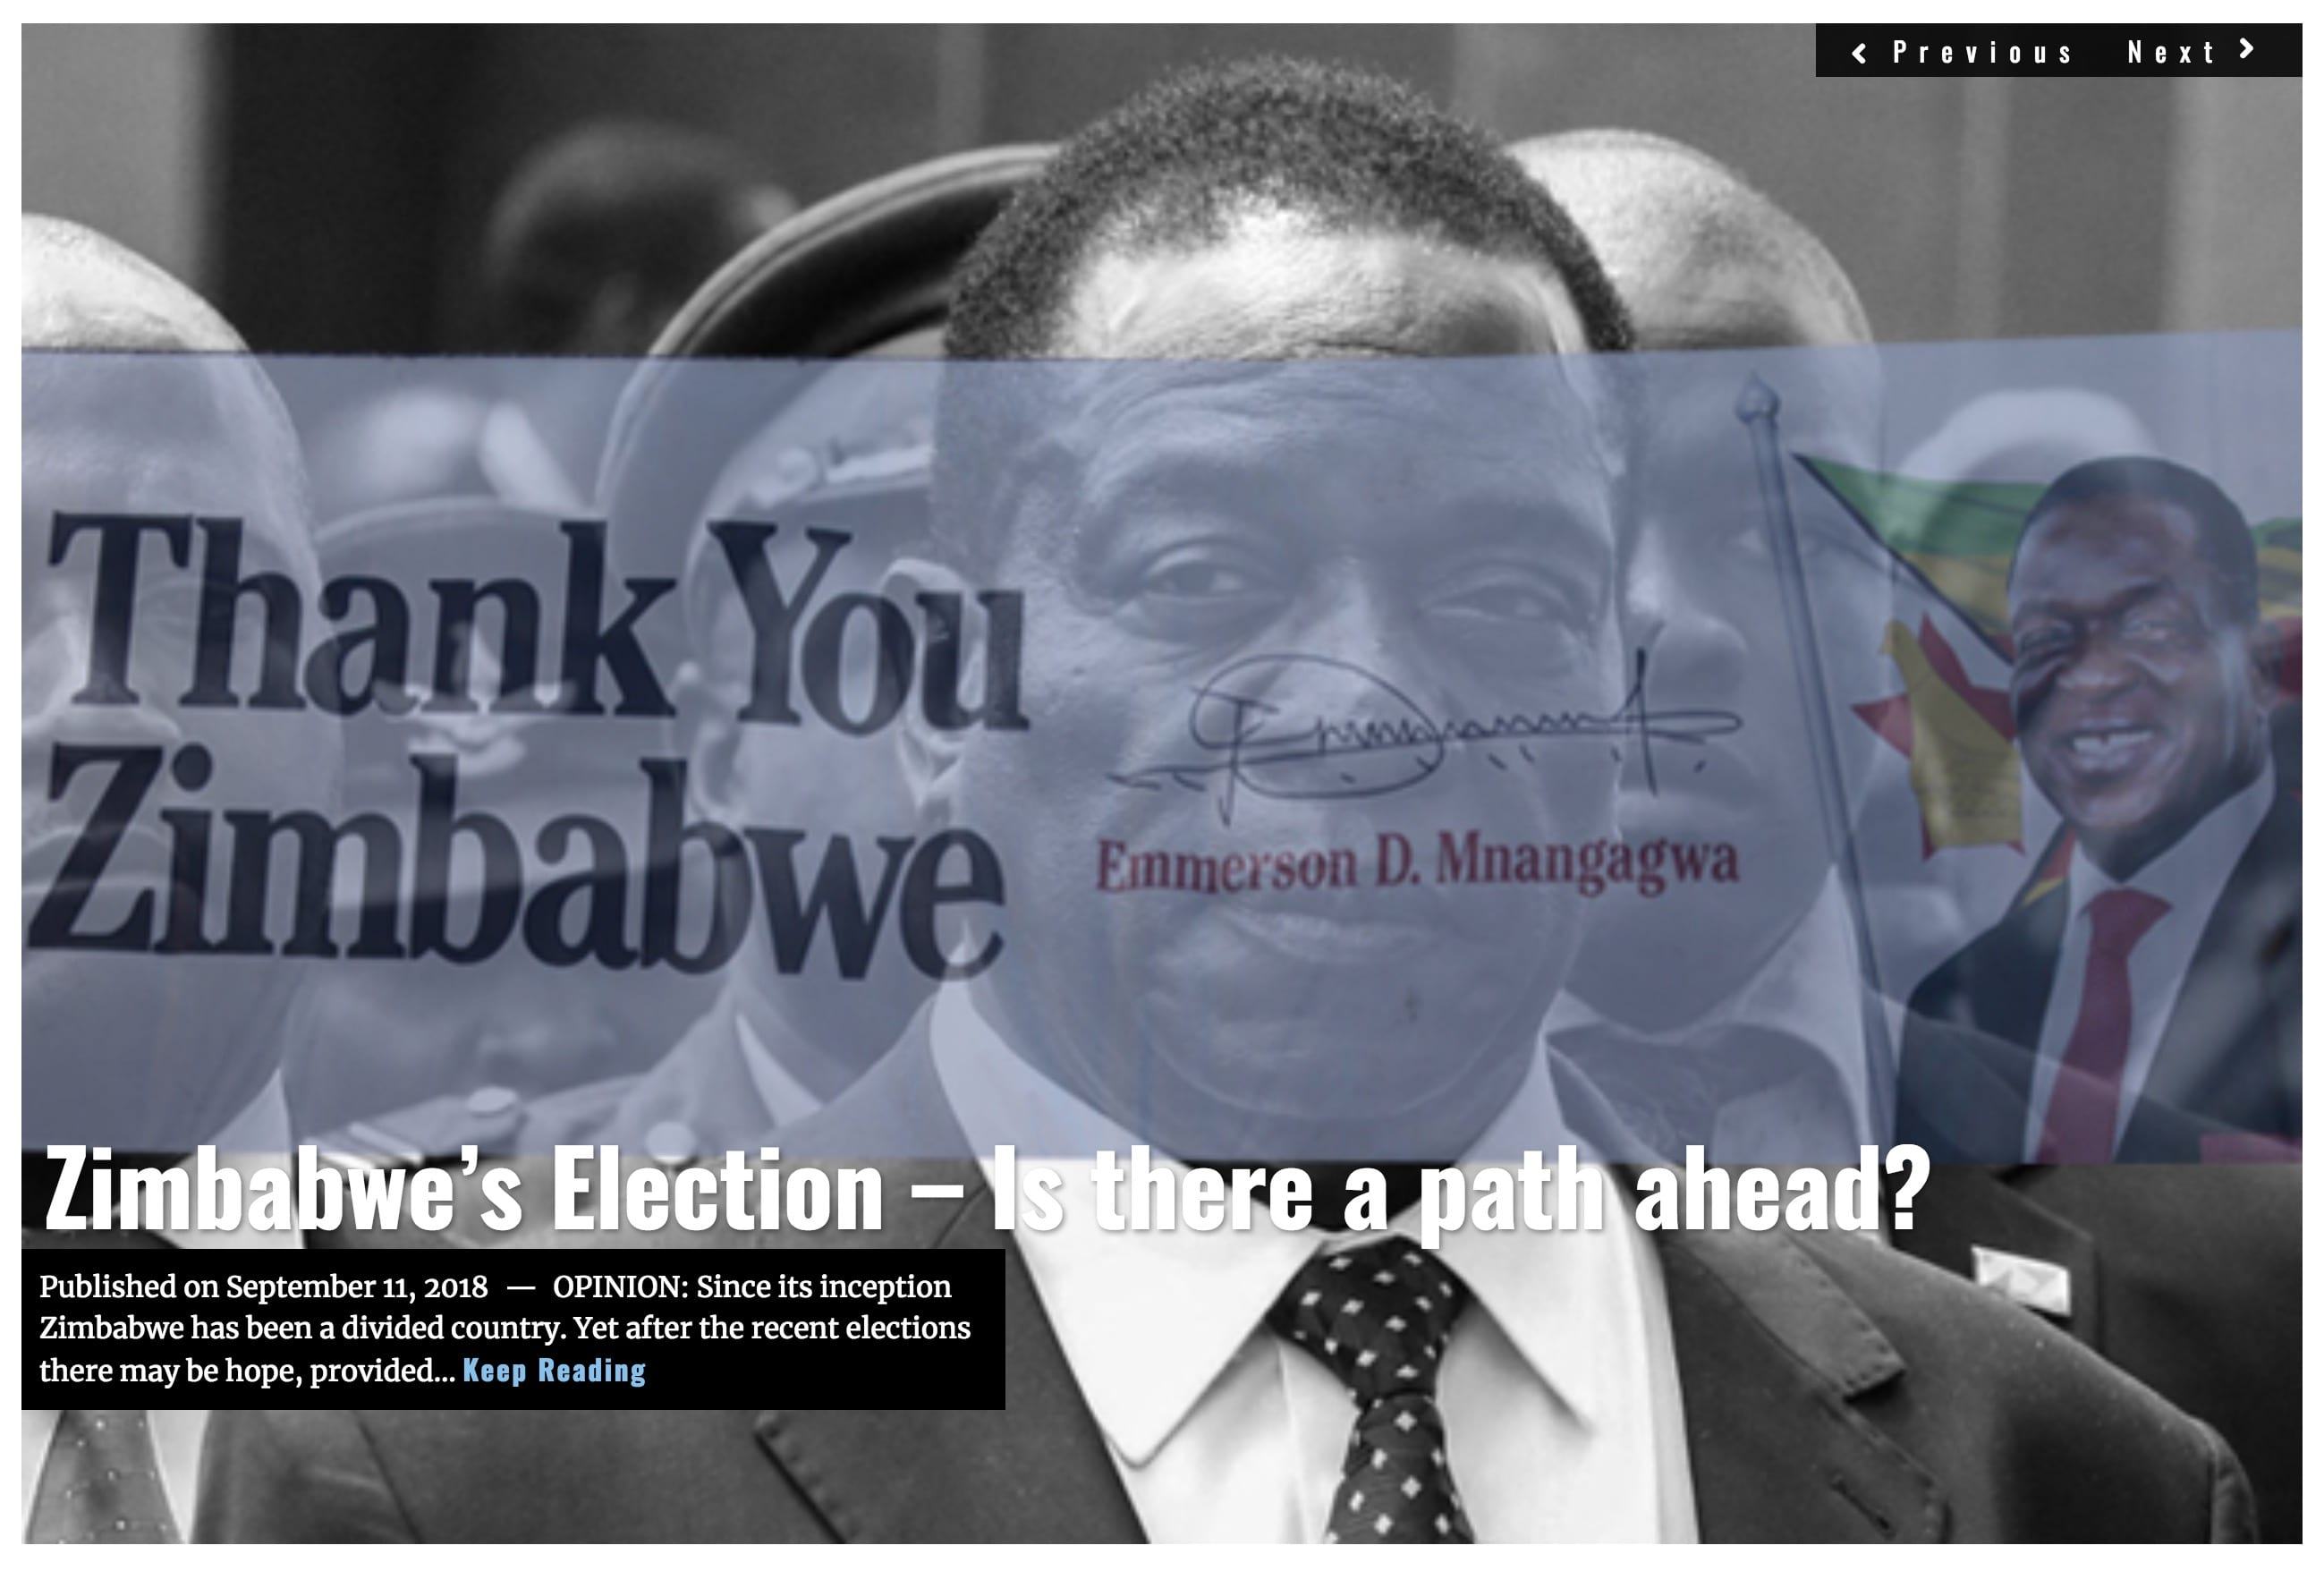 Image Lima Charlie News Headline Zimbabwe G. Busch SEPT 11 2018